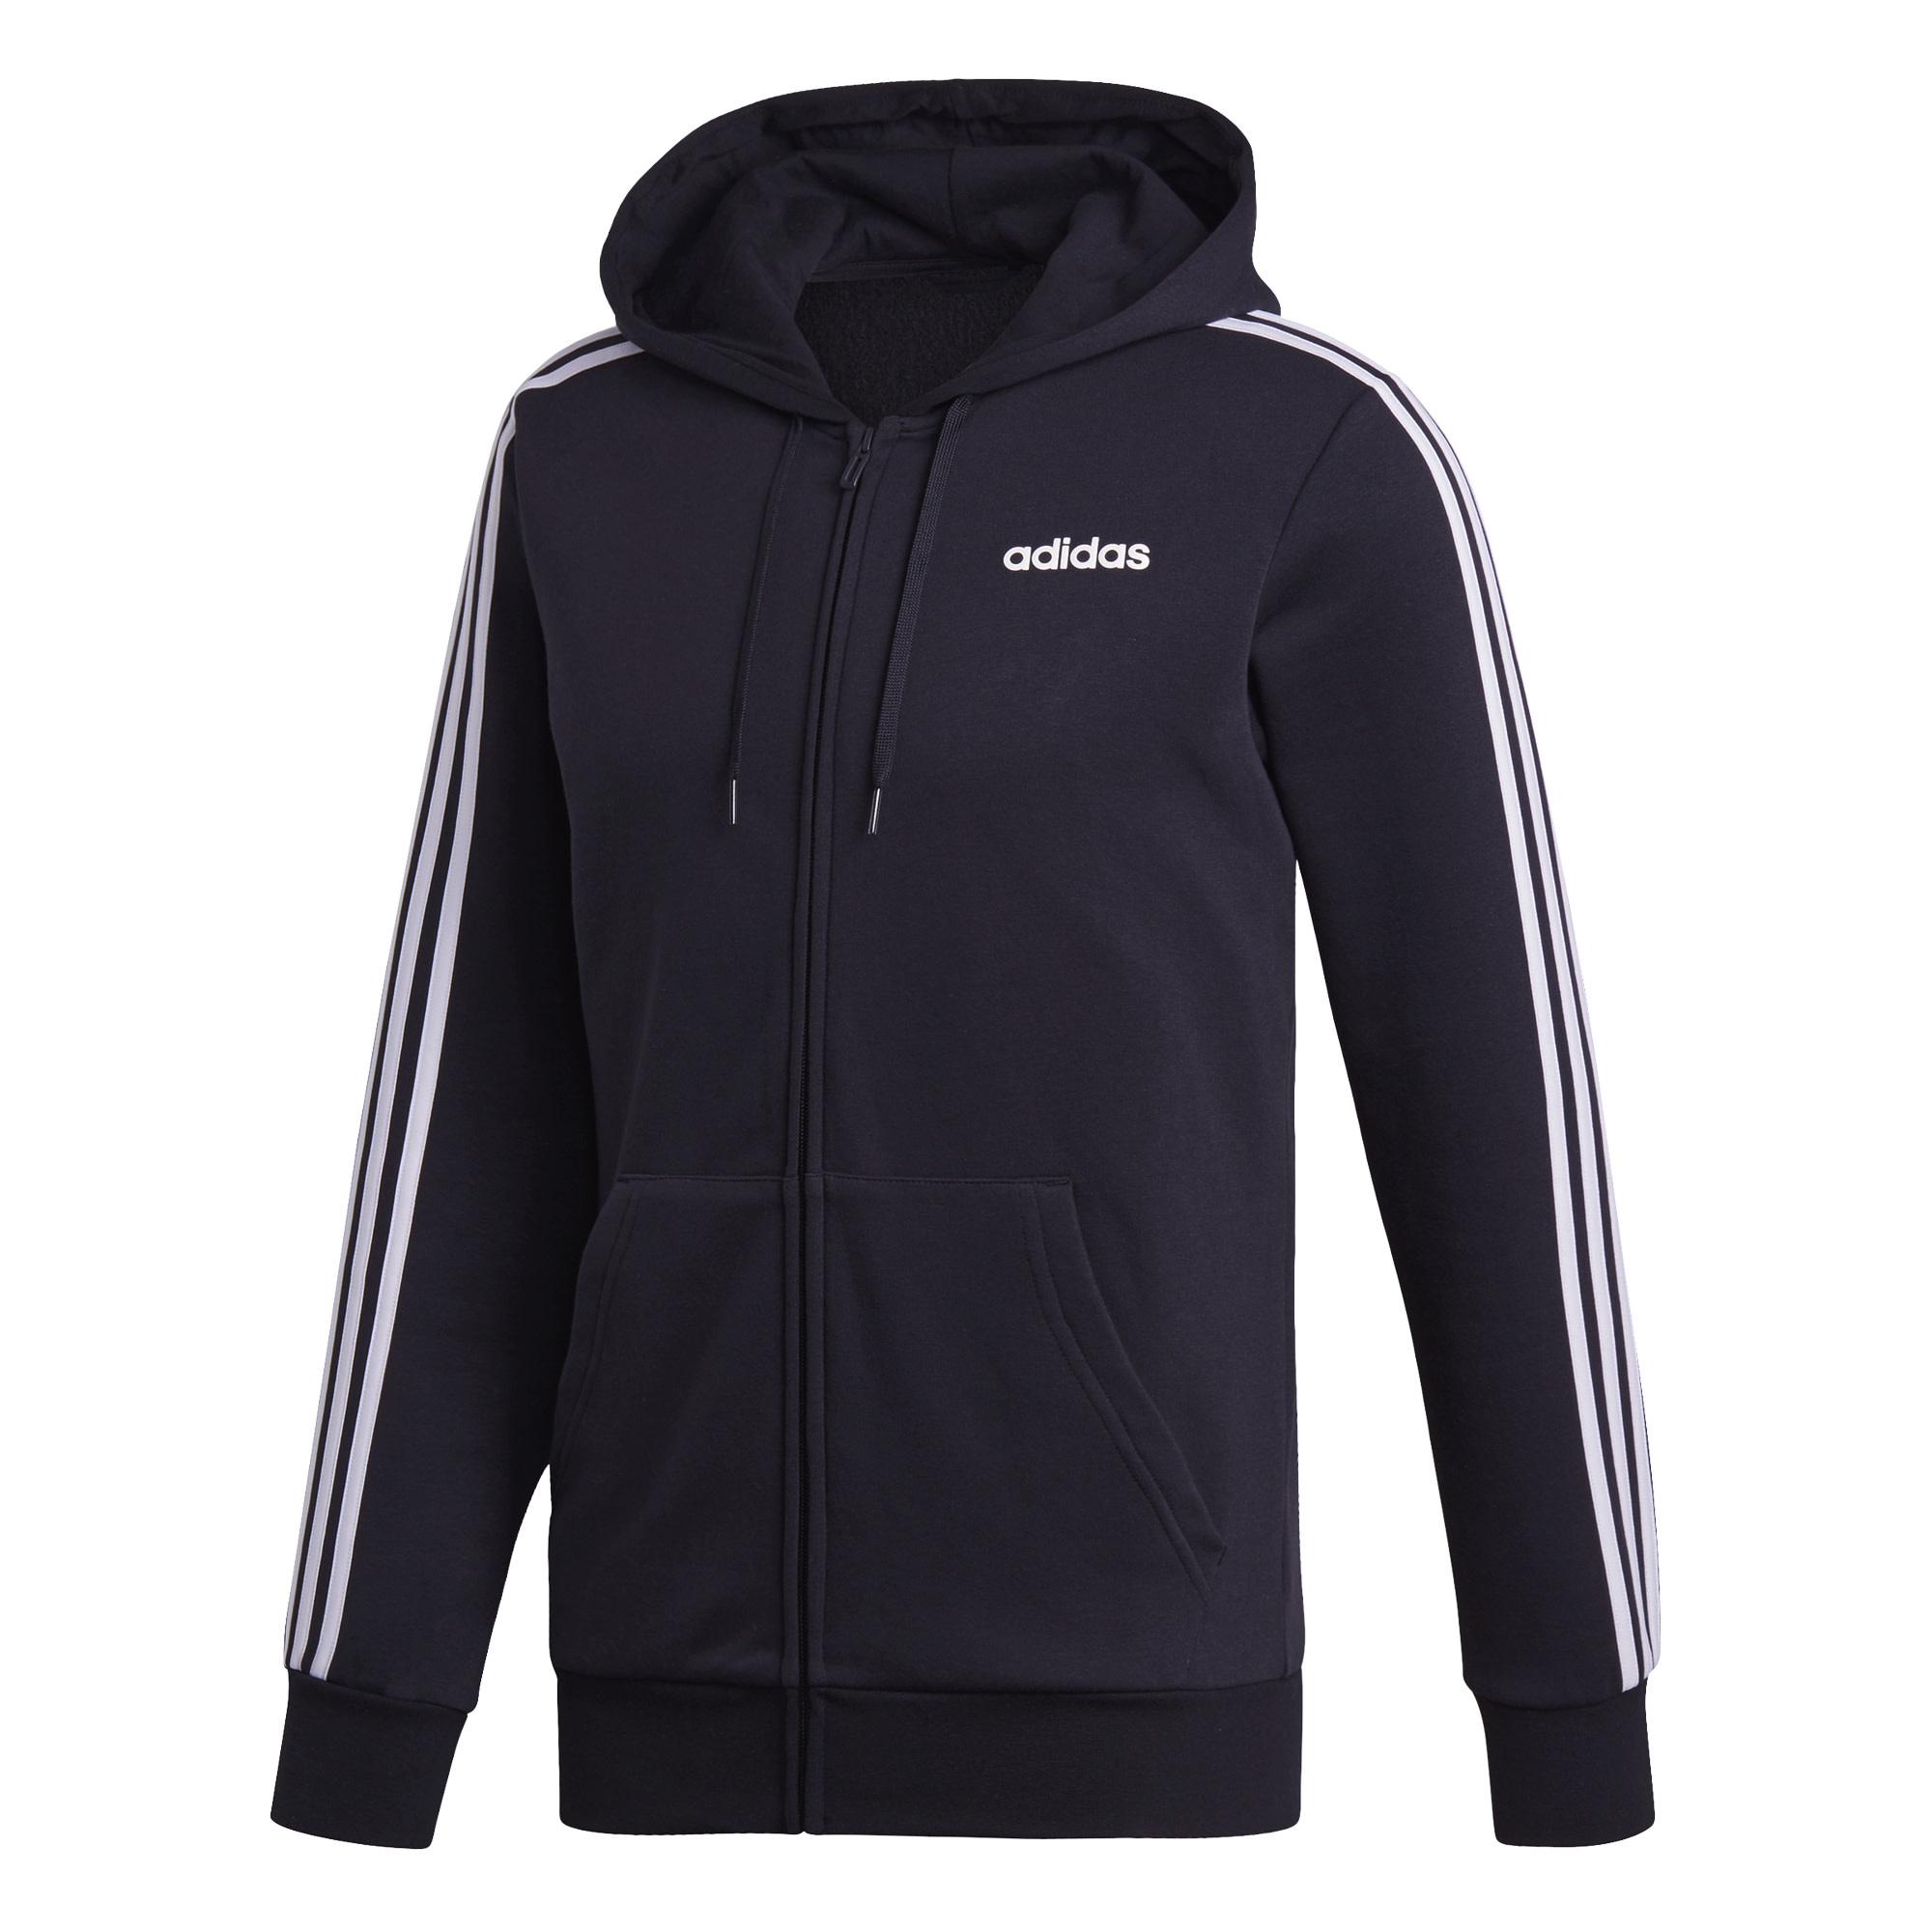 Adidas ADIDAS Essentials 3S Fleece Hoody